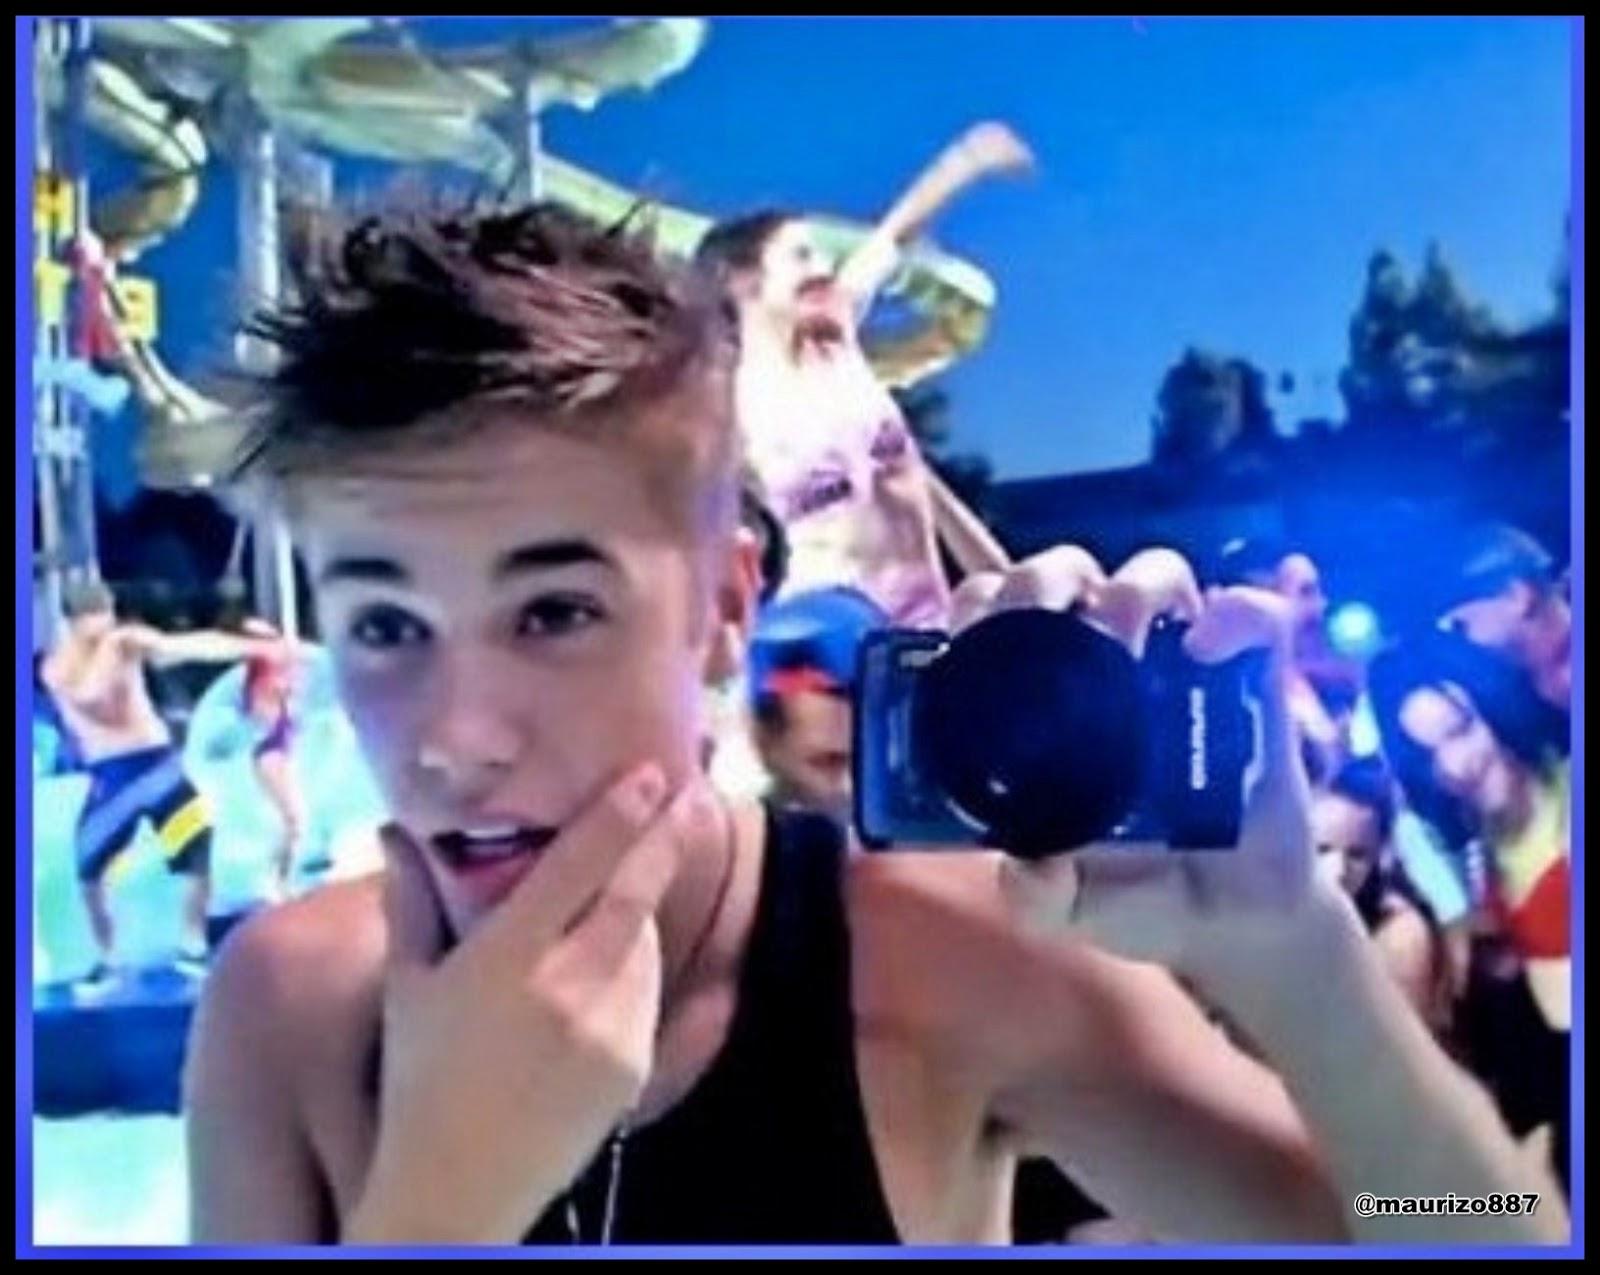 http://2.bp.blogspot.com/-QKqFw_RVm9A/UHuUZIe-mNI/AAAAAAAANFI/NnQz6n8QVCA/s1600/Justin+Bieber+-+Beauty+And+A+Beat.jpg